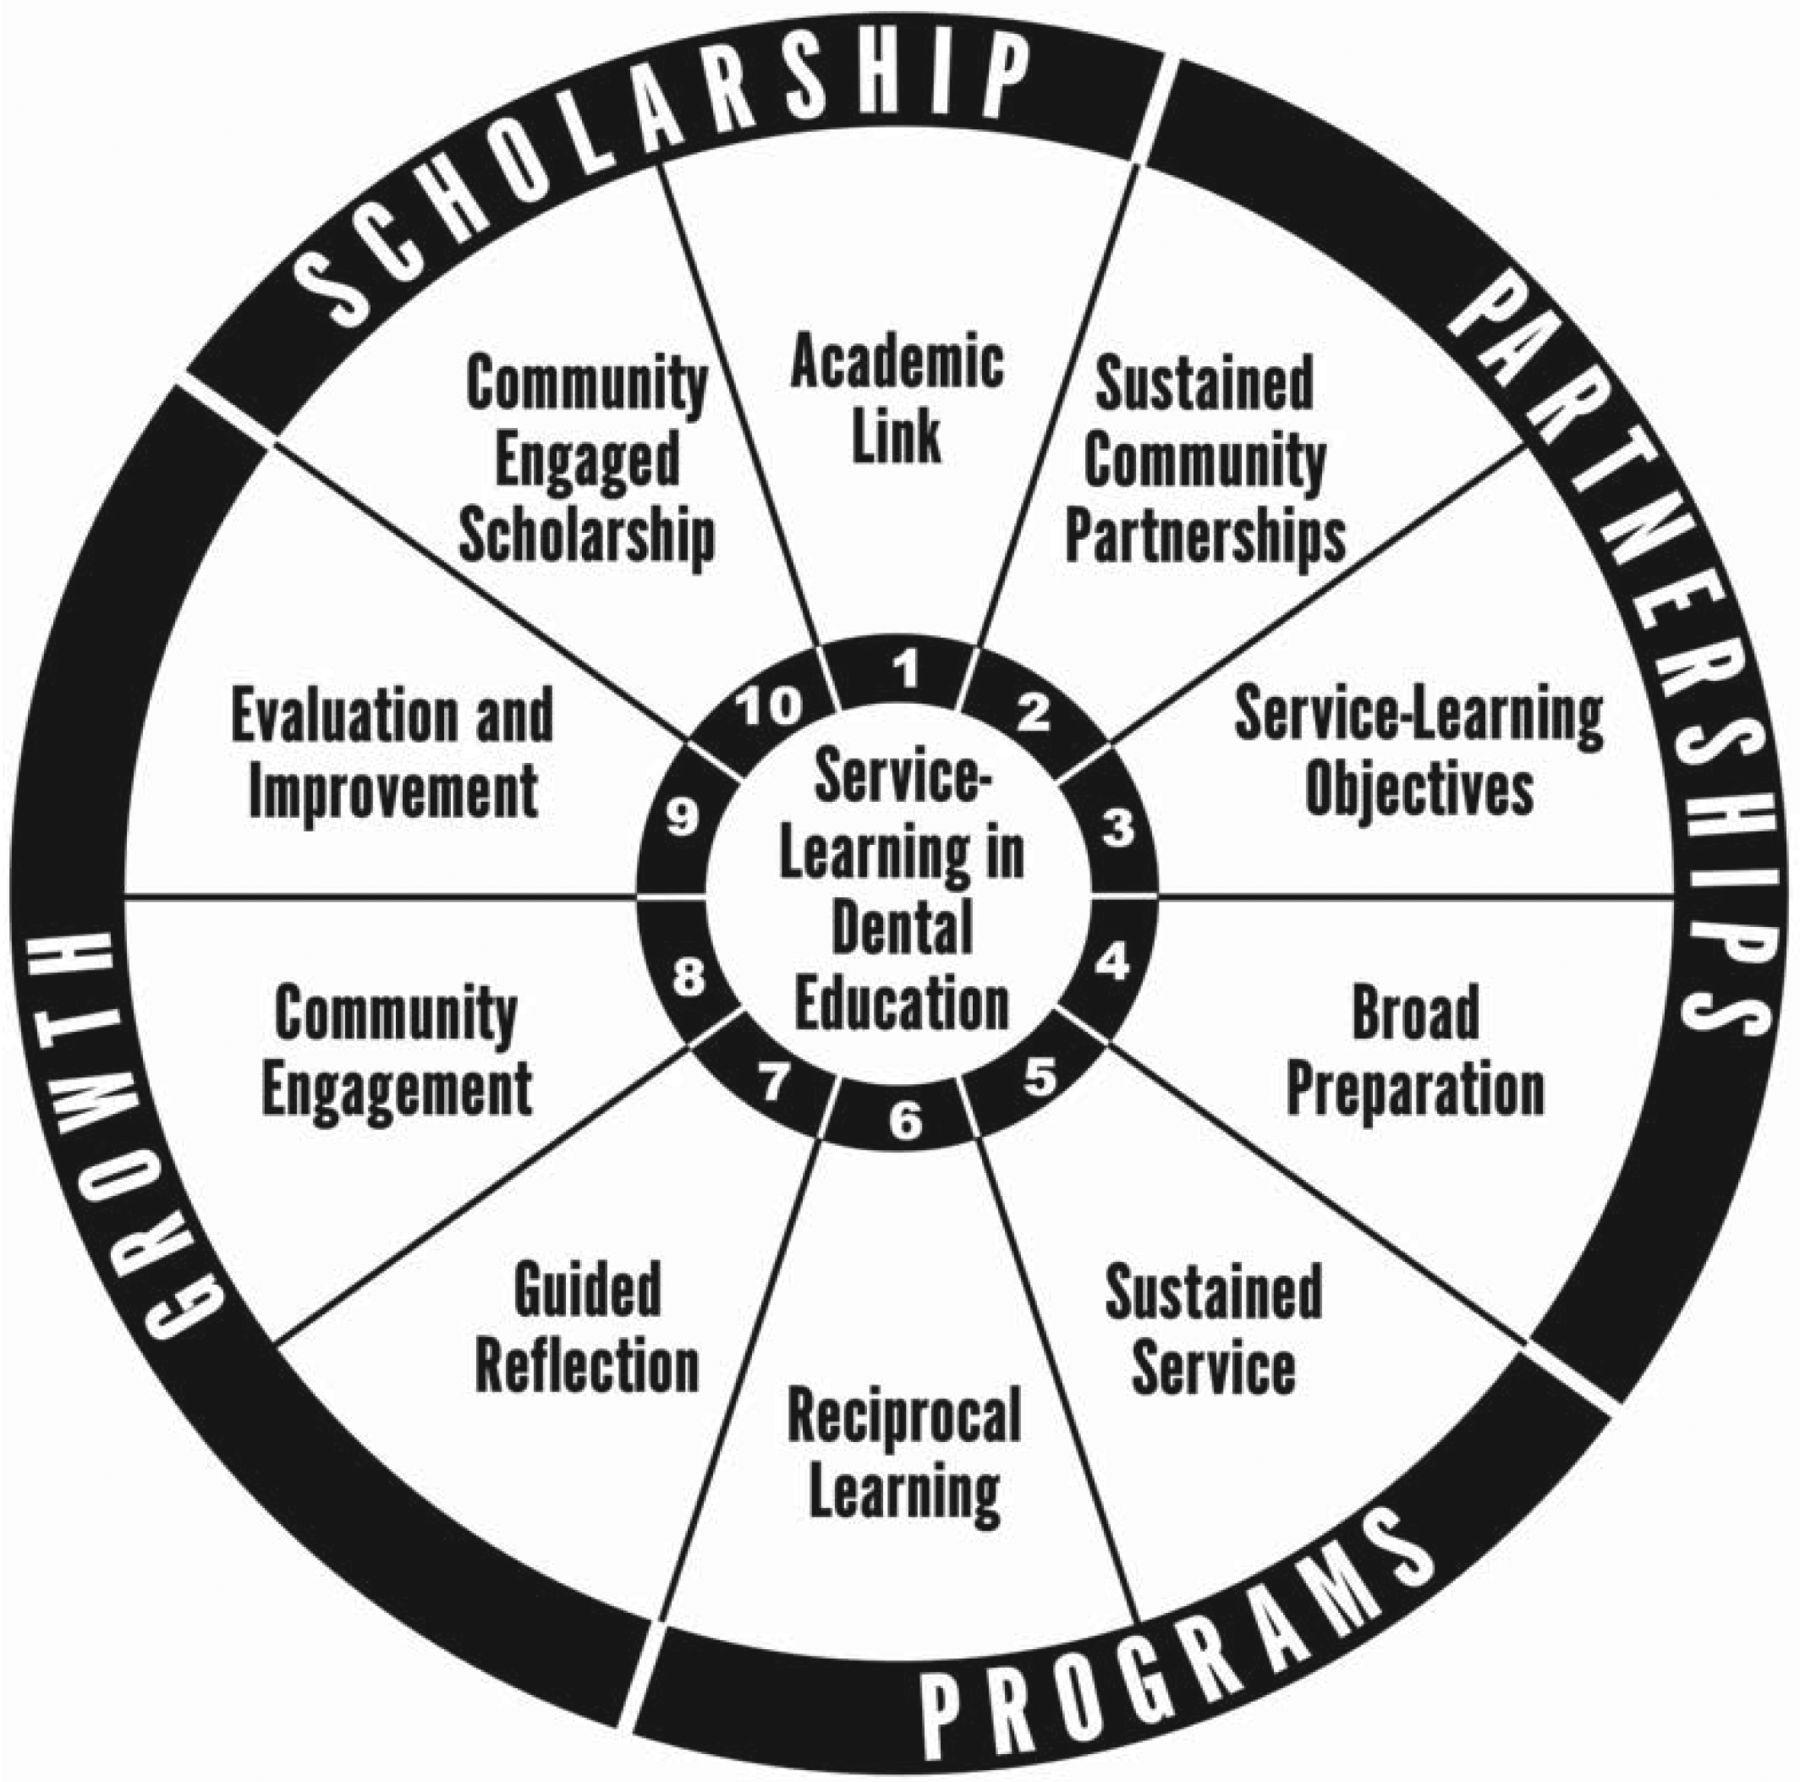 Strategies for Service-Learning Assessment in Dental